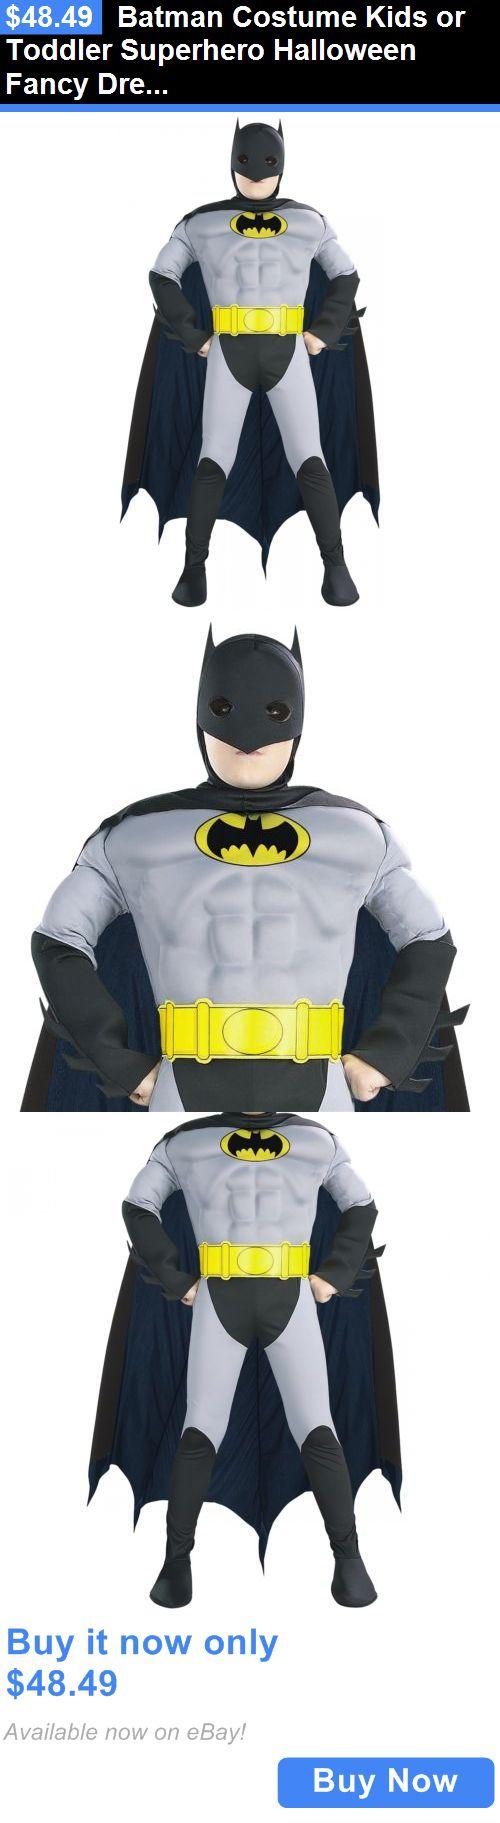 Halloween Costumes: Batman Costume Kids Or Toddler Superhero Halloween Fancy Dress BUY IT NOW ONLY: $48.49